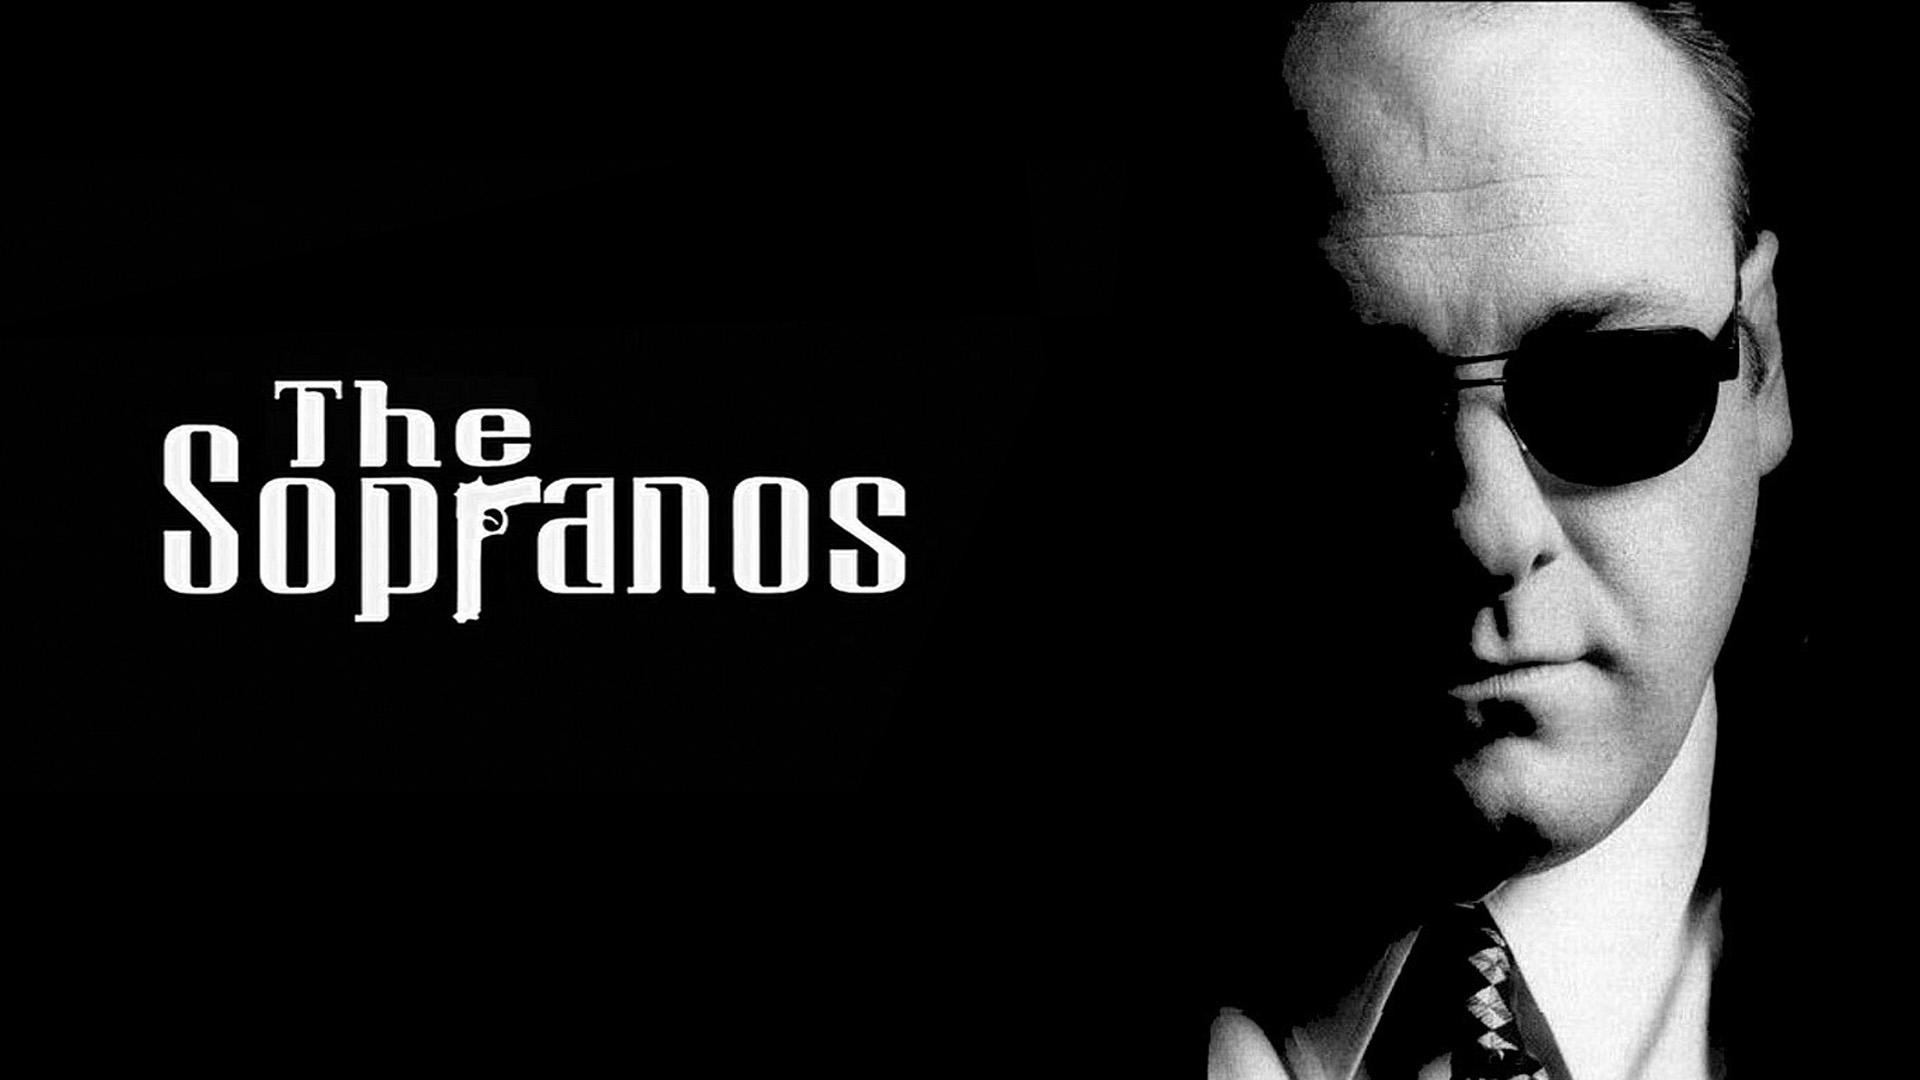 The Sopranos wallpaper 2